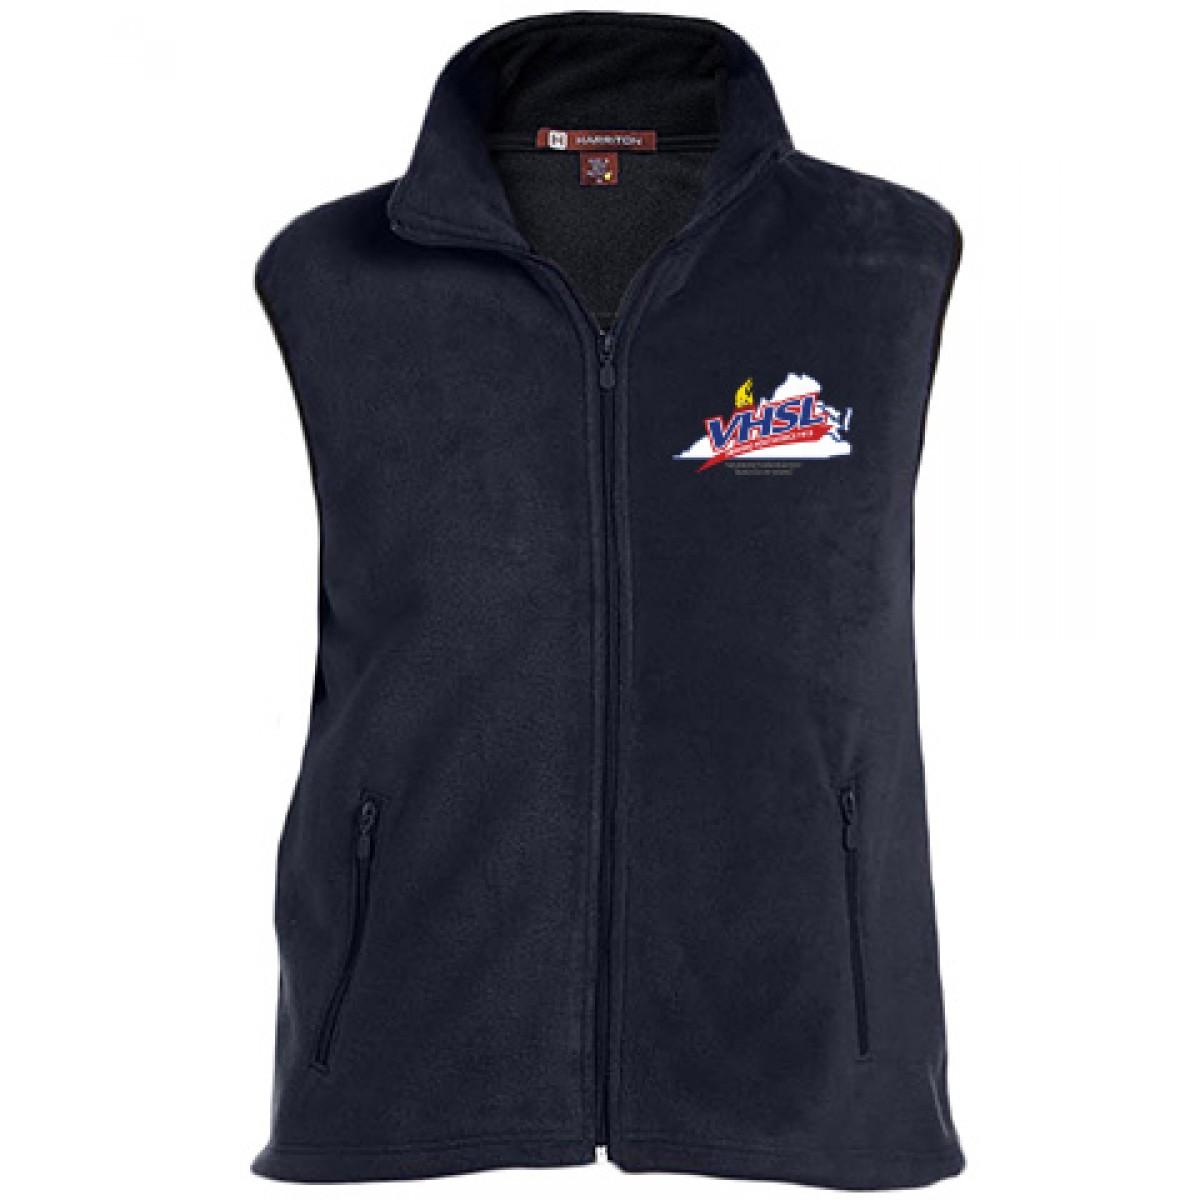 Harriton Embroidered Mens Vest-Navy-XL